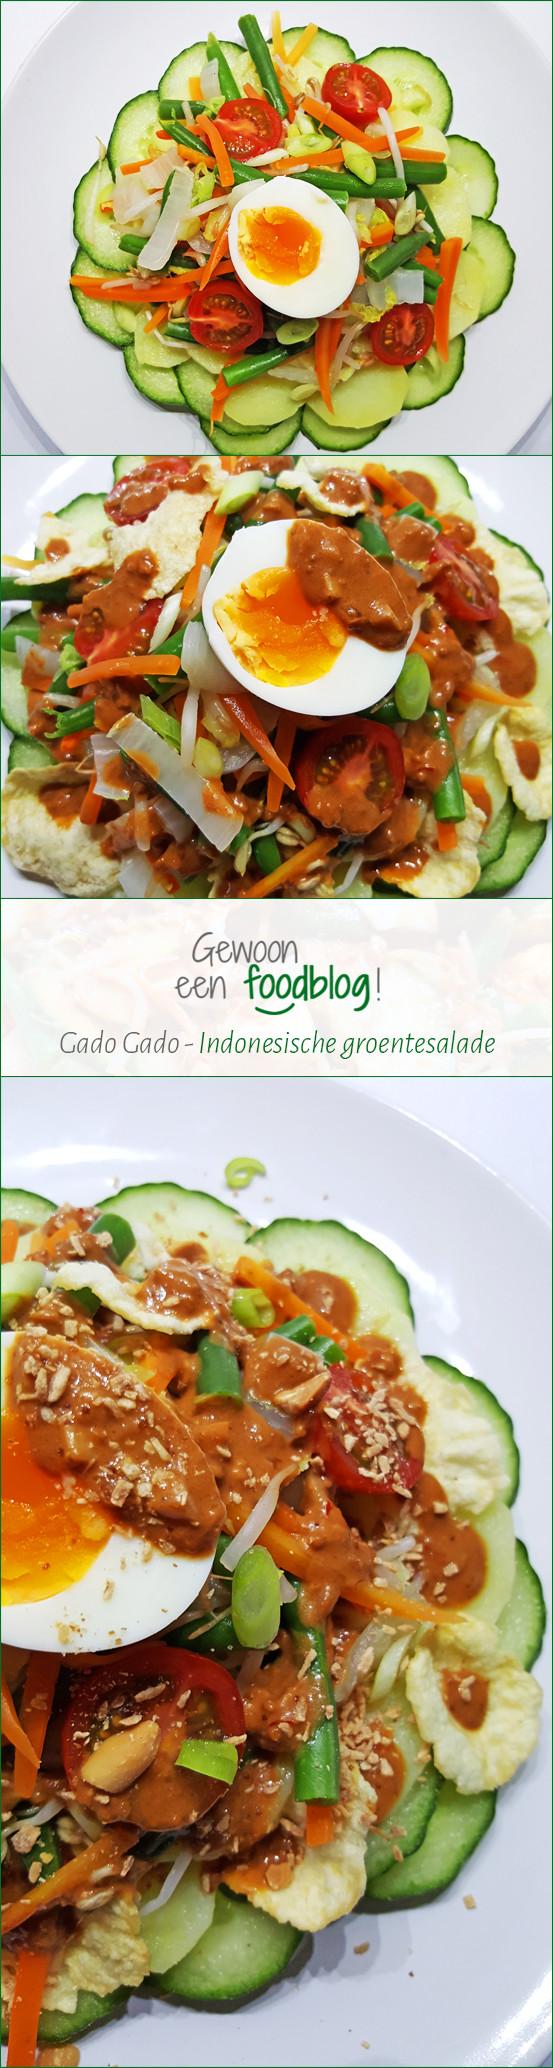 Gado Gado   Indonesische groentesalade met pindasaus